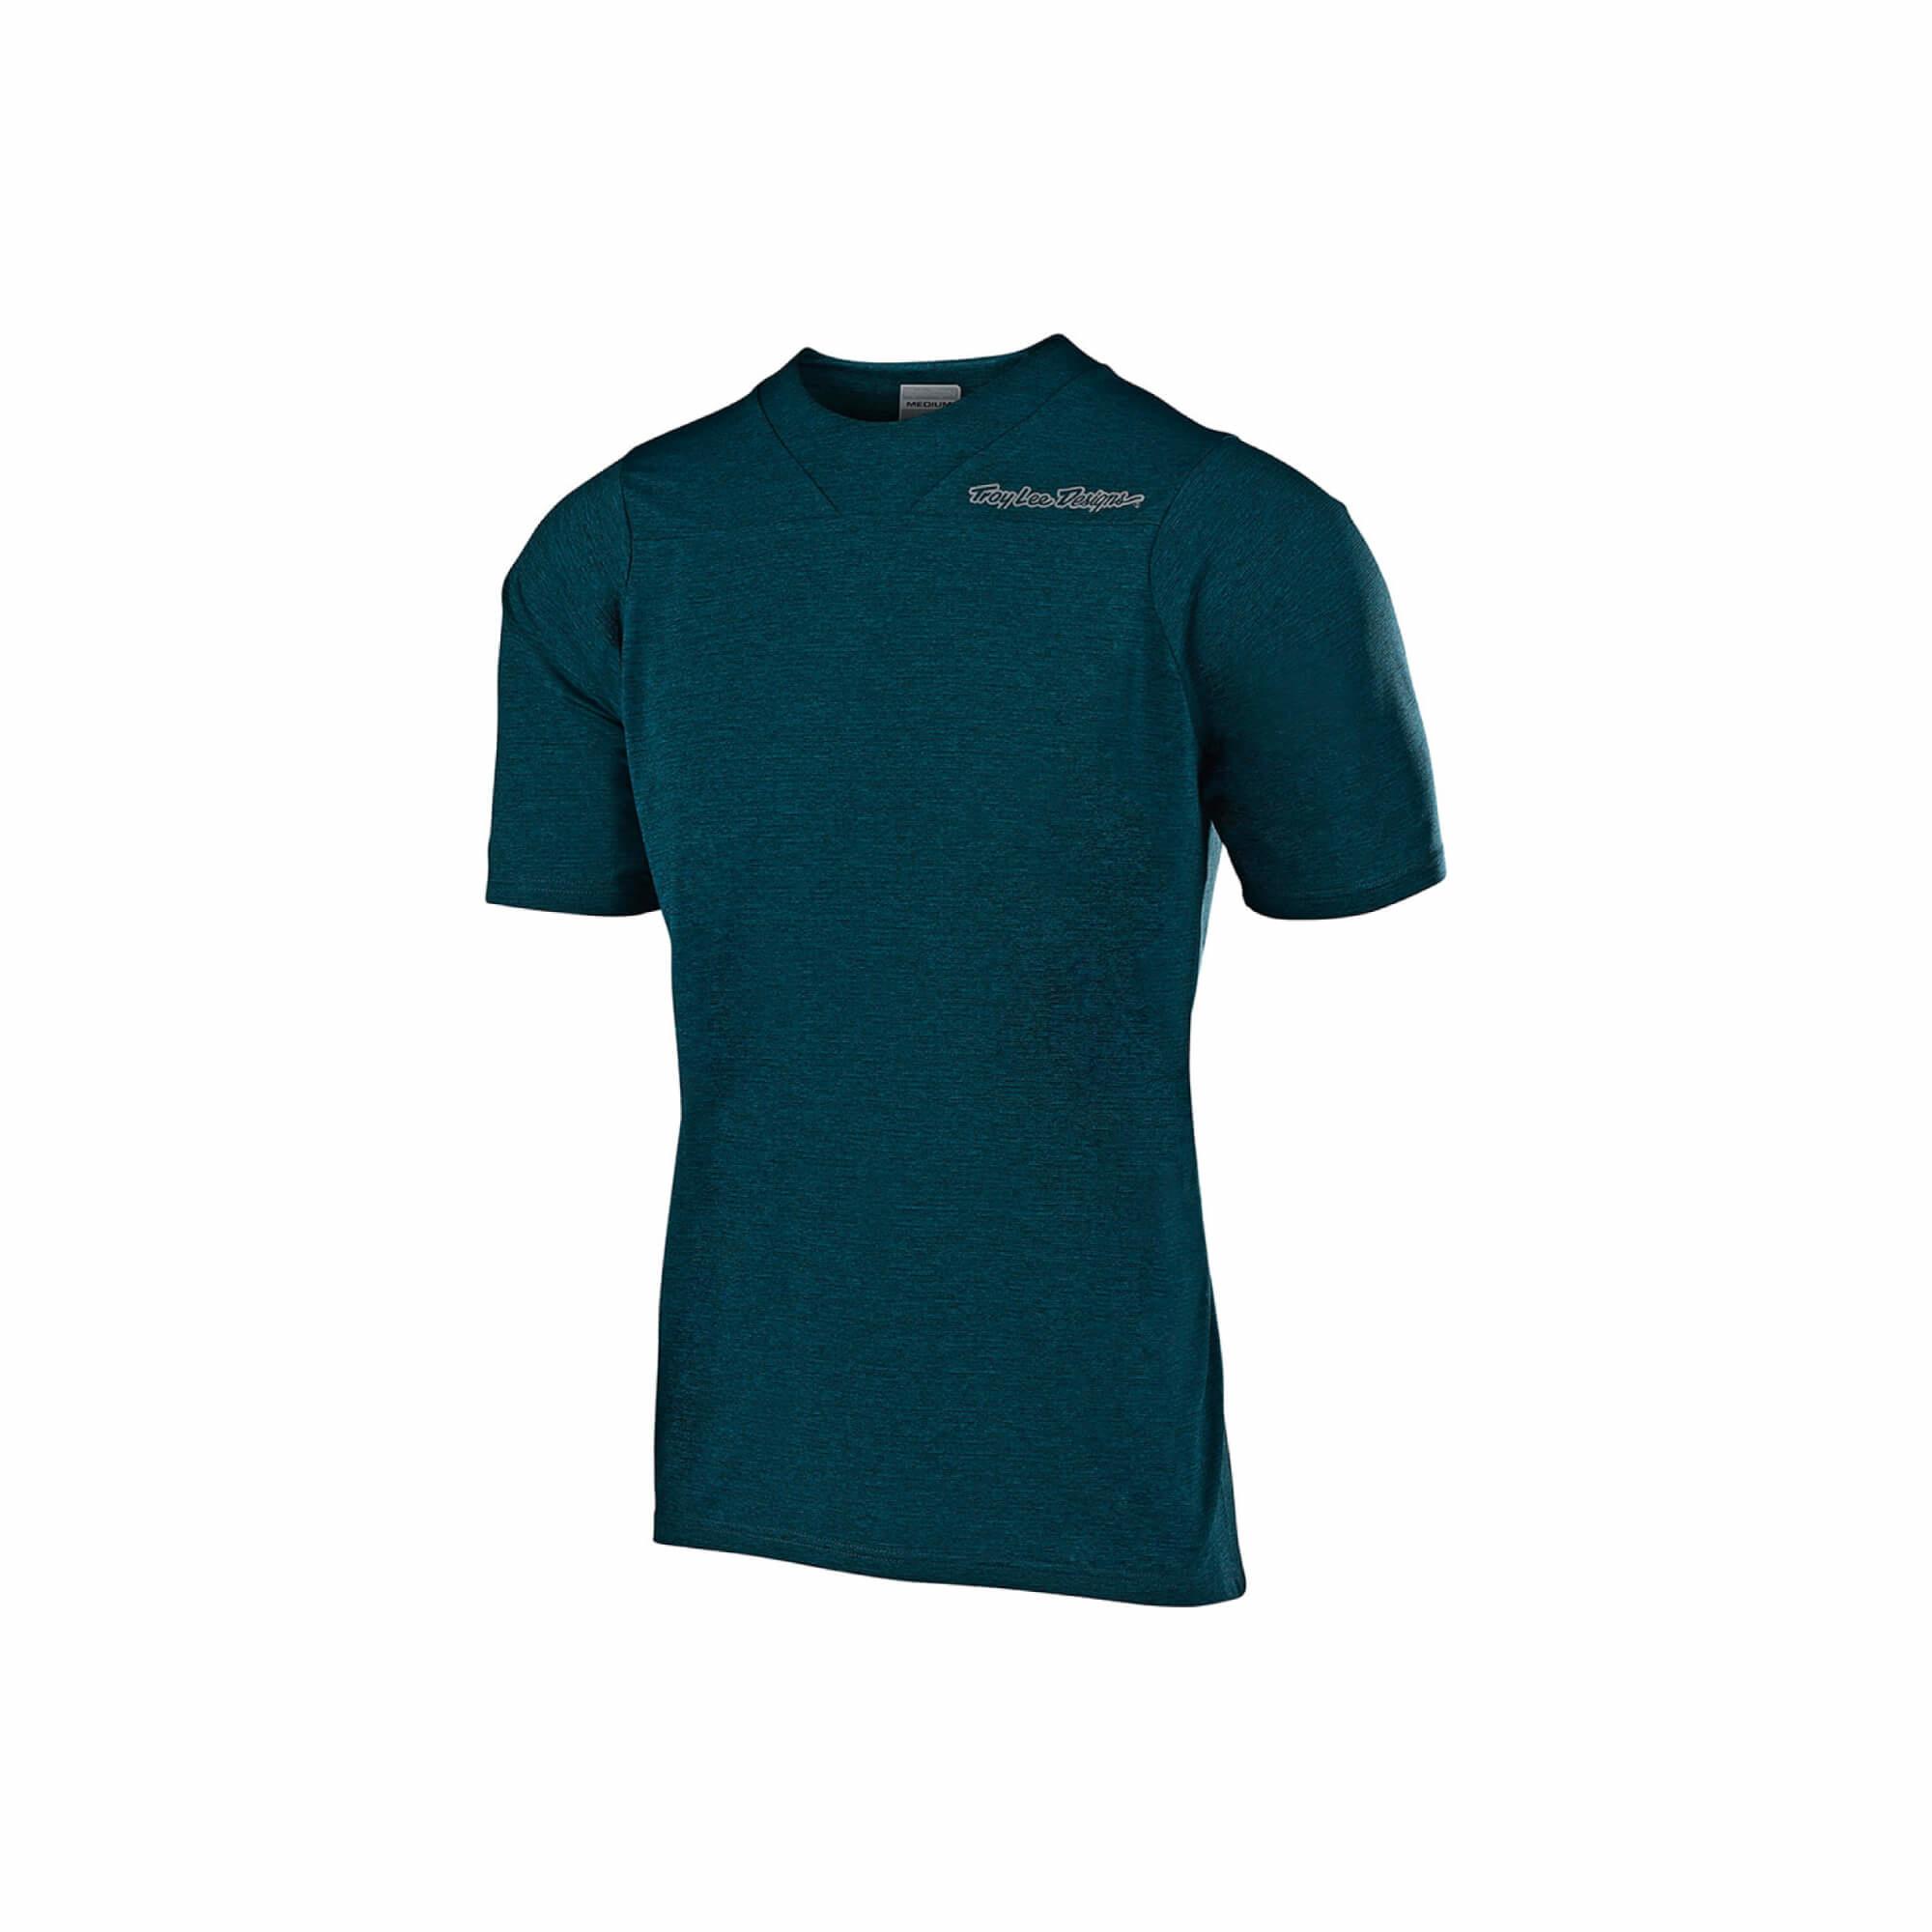 Skyline Short Sleeve Jersey HTR 20-1